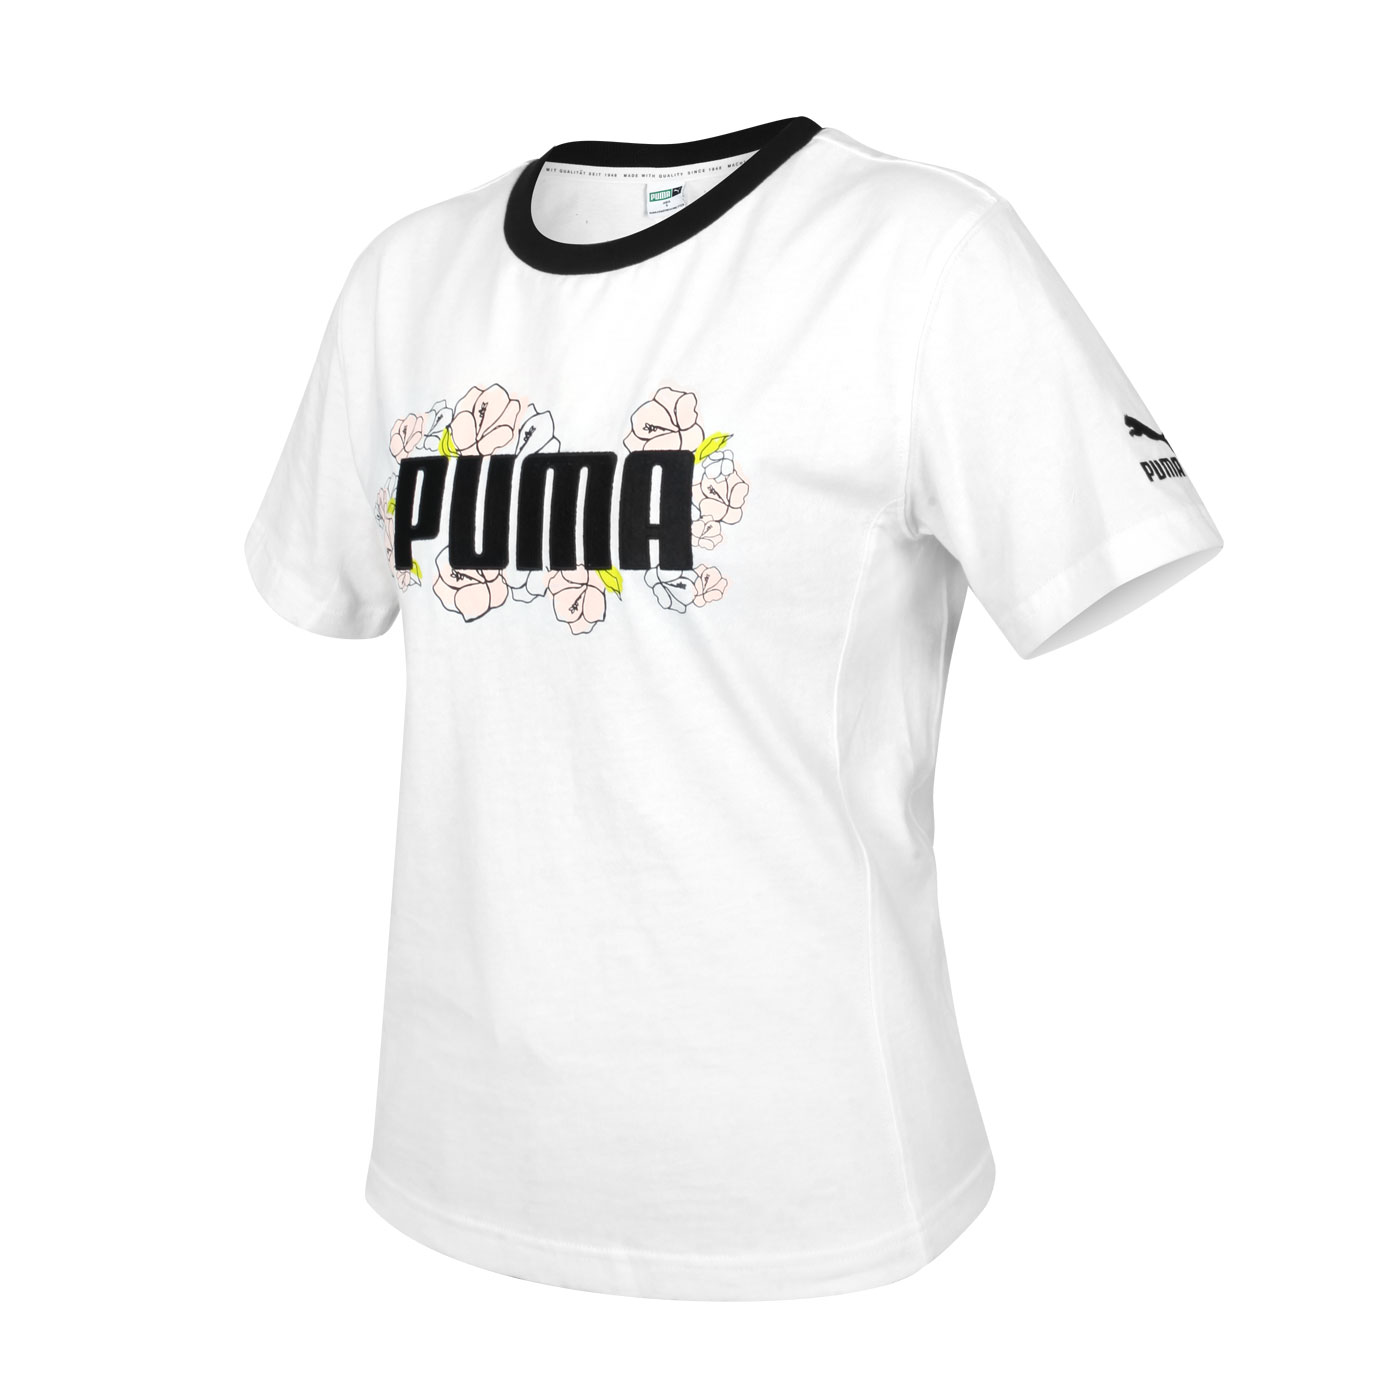 PUMA 女款Floral短袖T恤 53204202 - 白黑粉綠